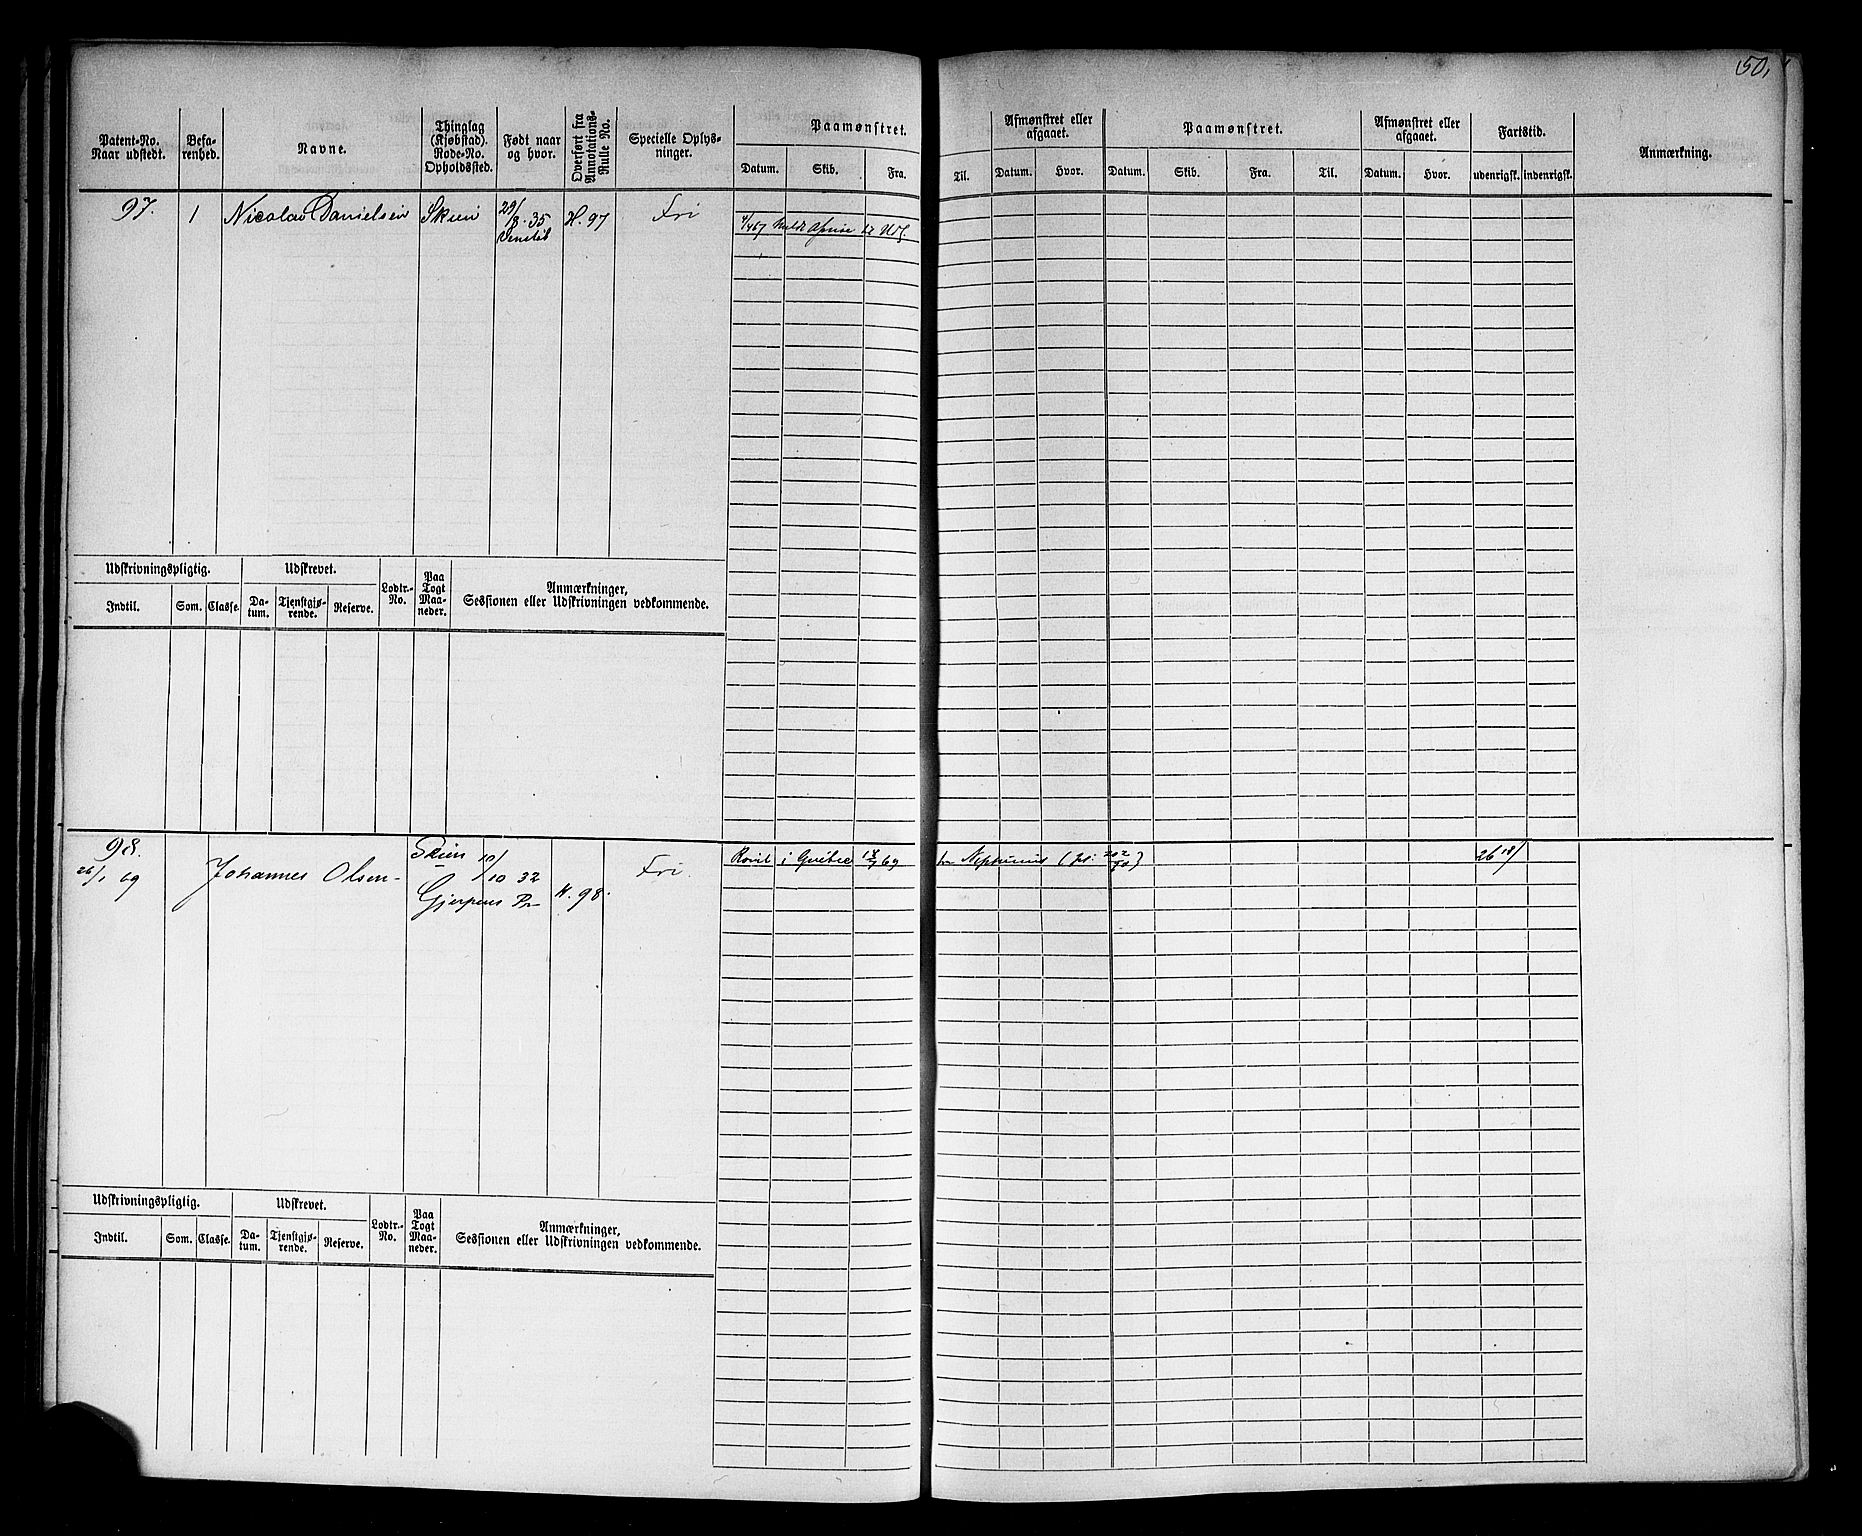 SAKO, Skien innrulleringskontor, F/Fb/L0003: Hovedrulle, 1868-1871, s. 51